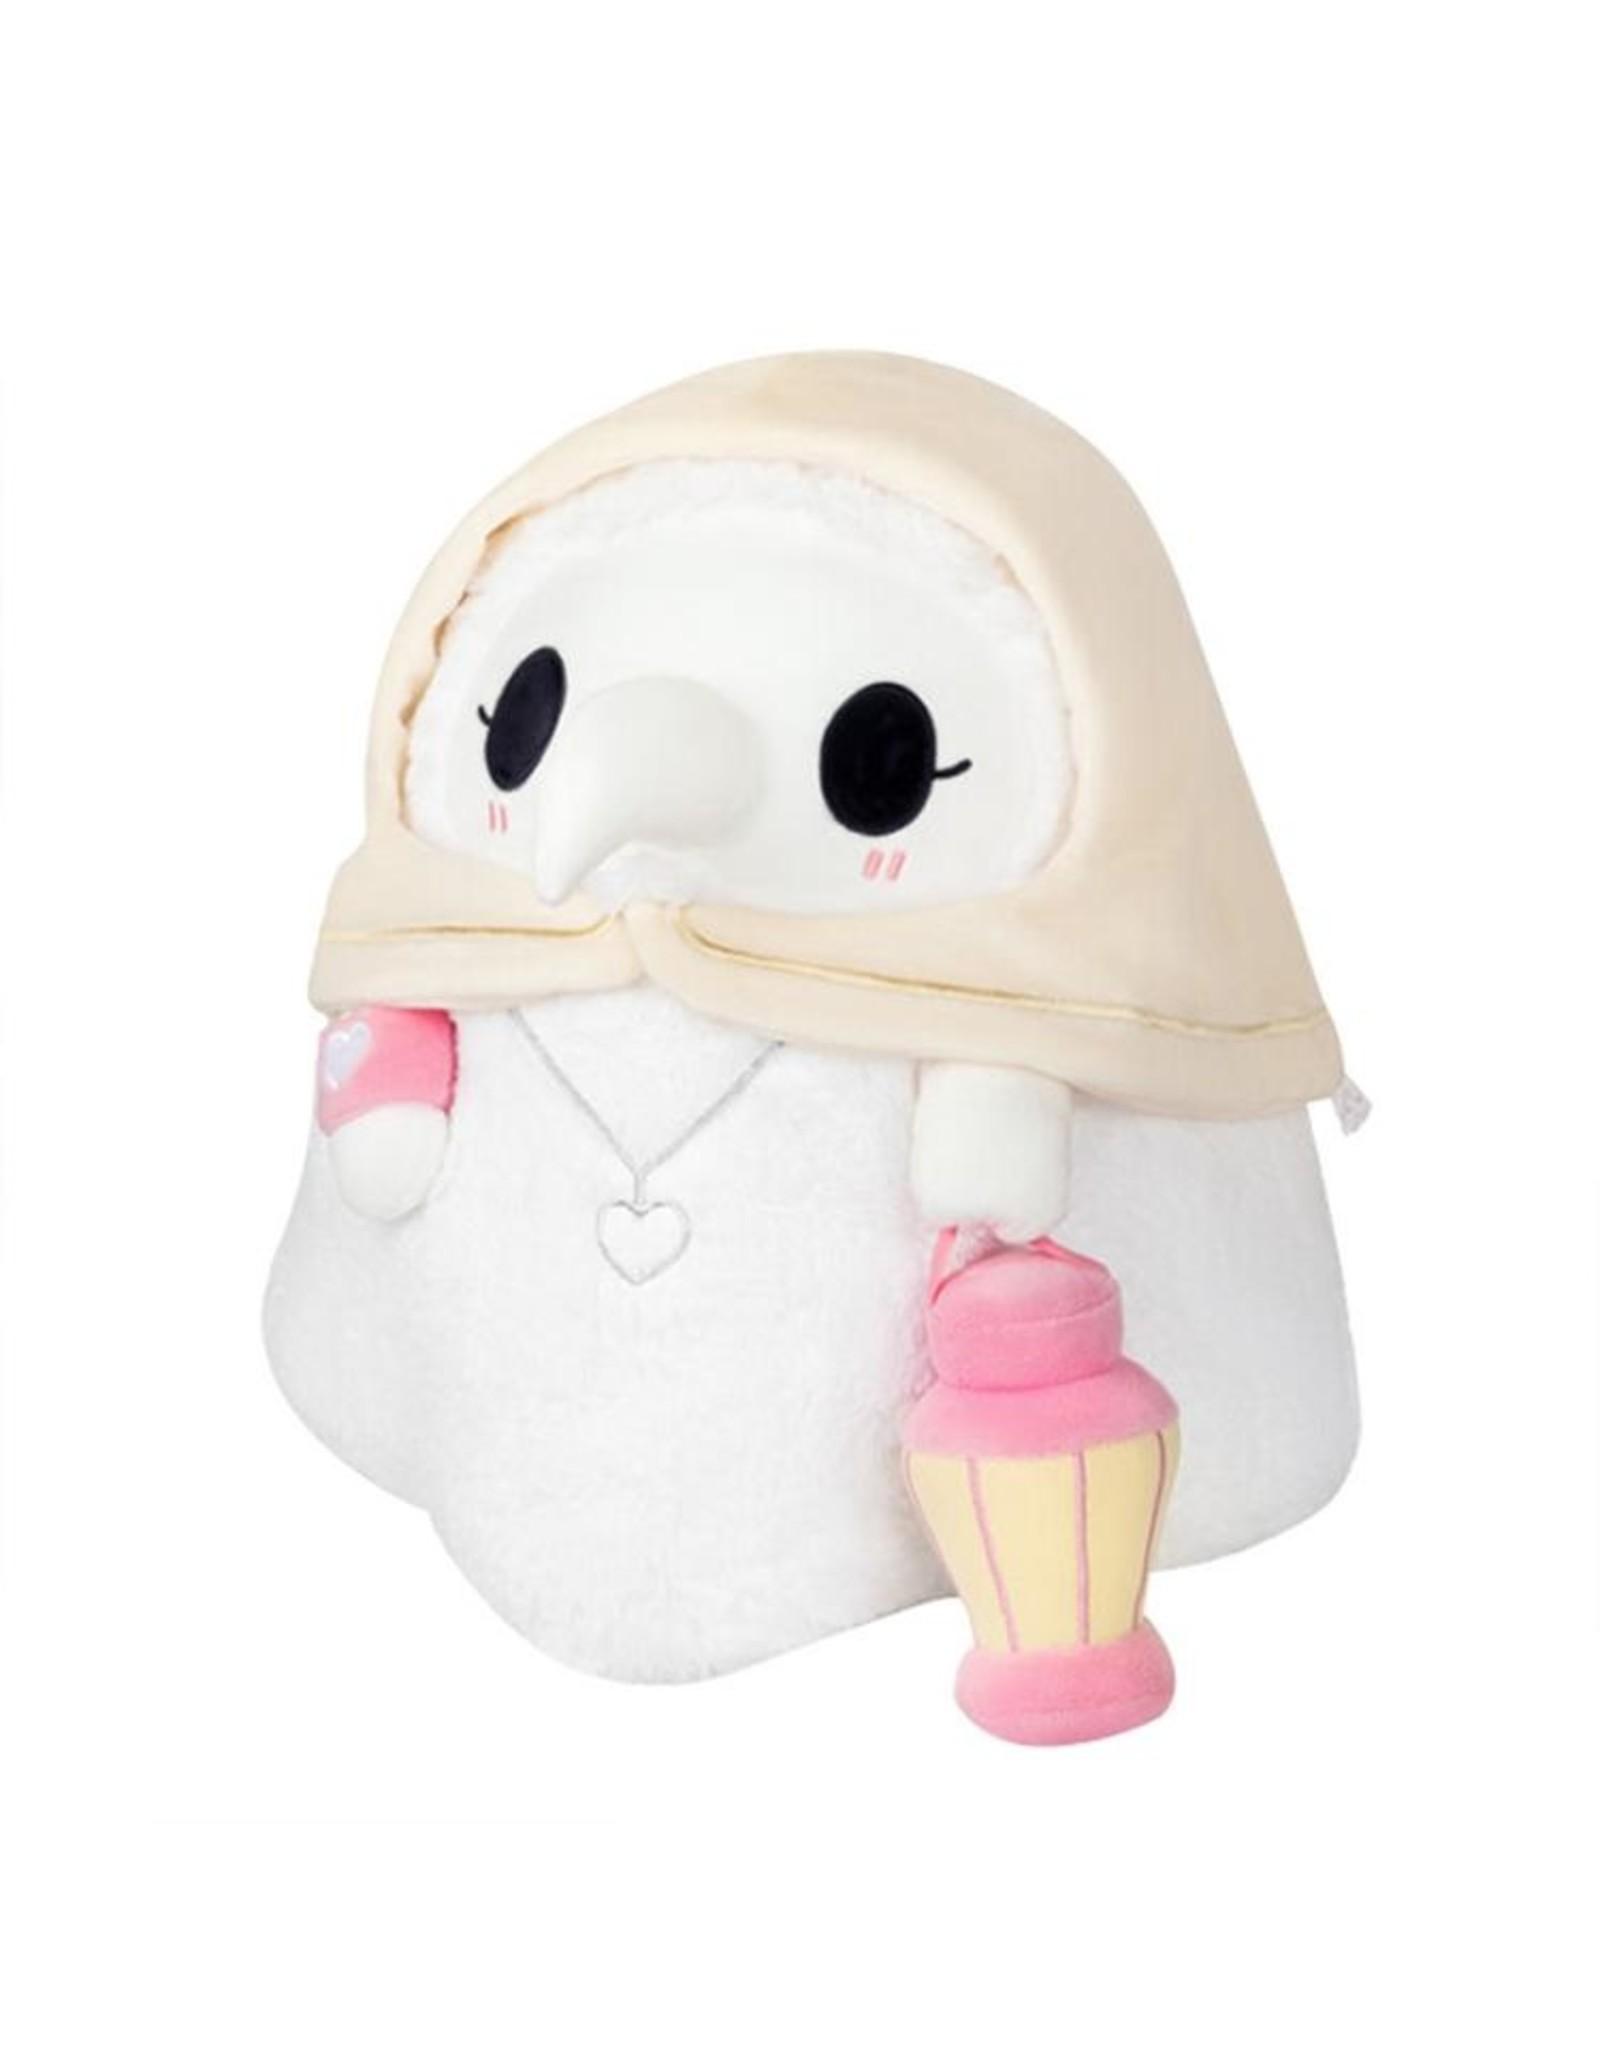 Squishable Mini Squishable Plague Nurse